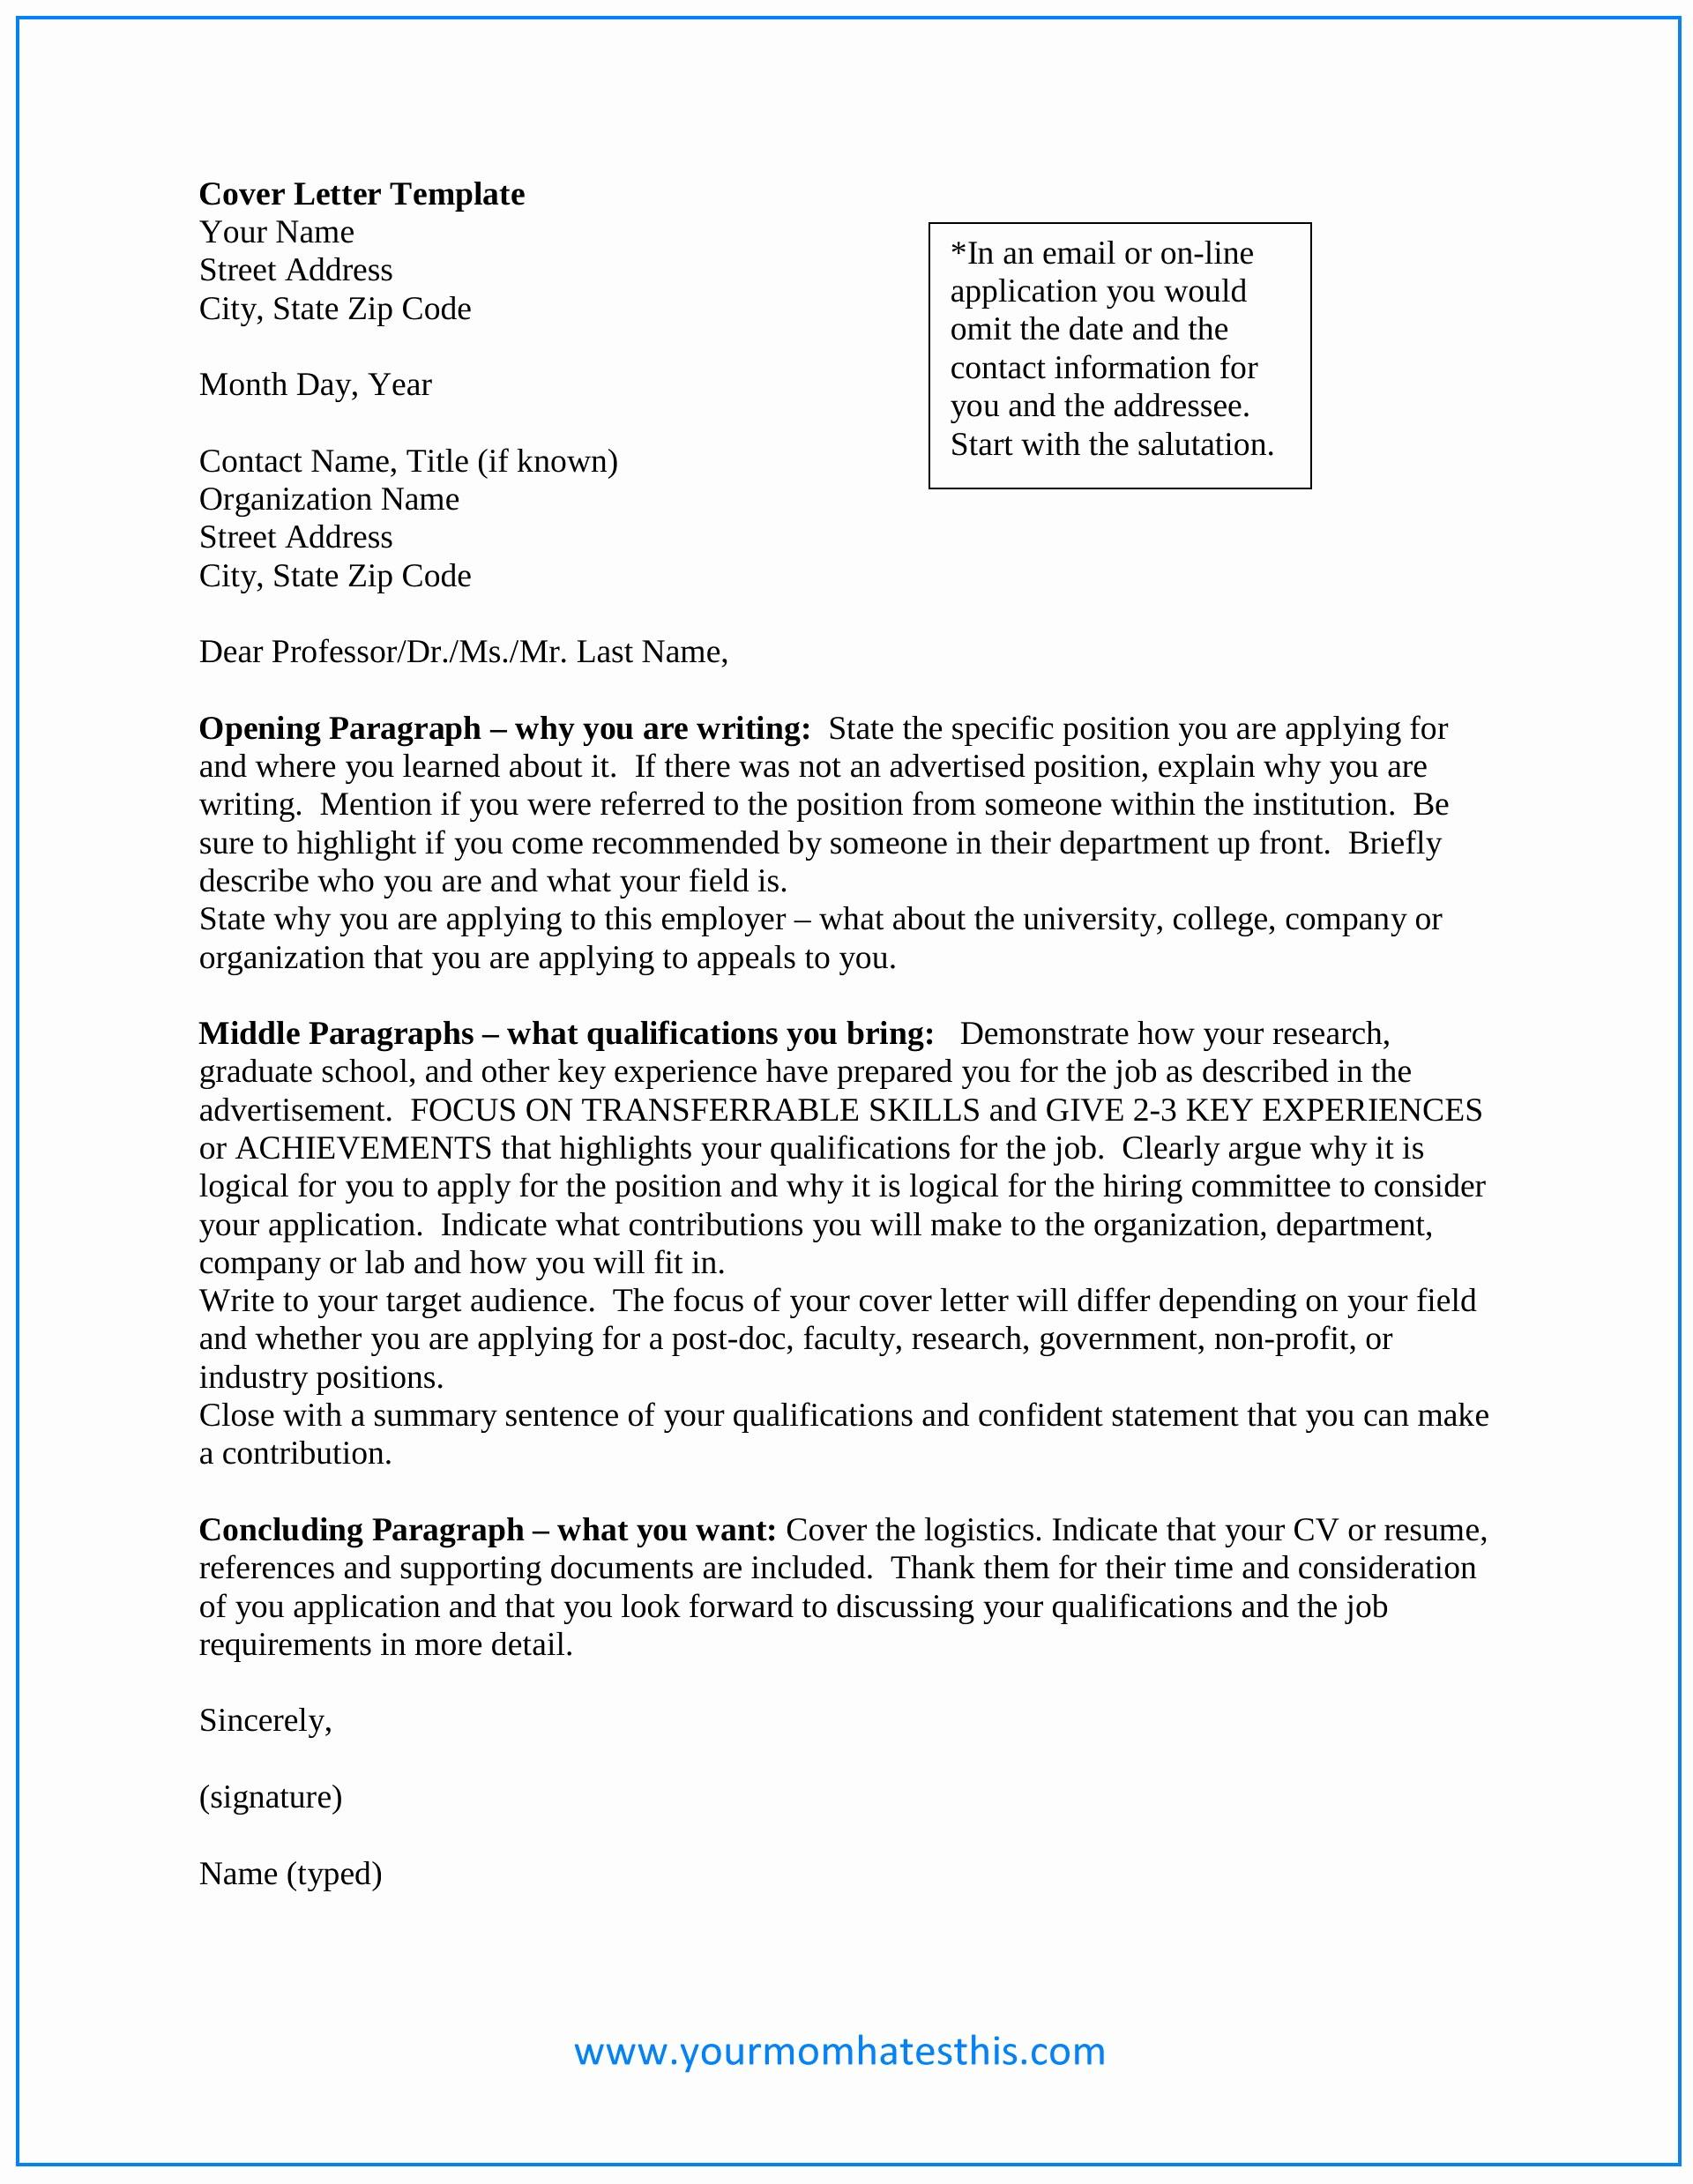 Cover Letter Template Free Download Elegant Download Cover Letter Samples